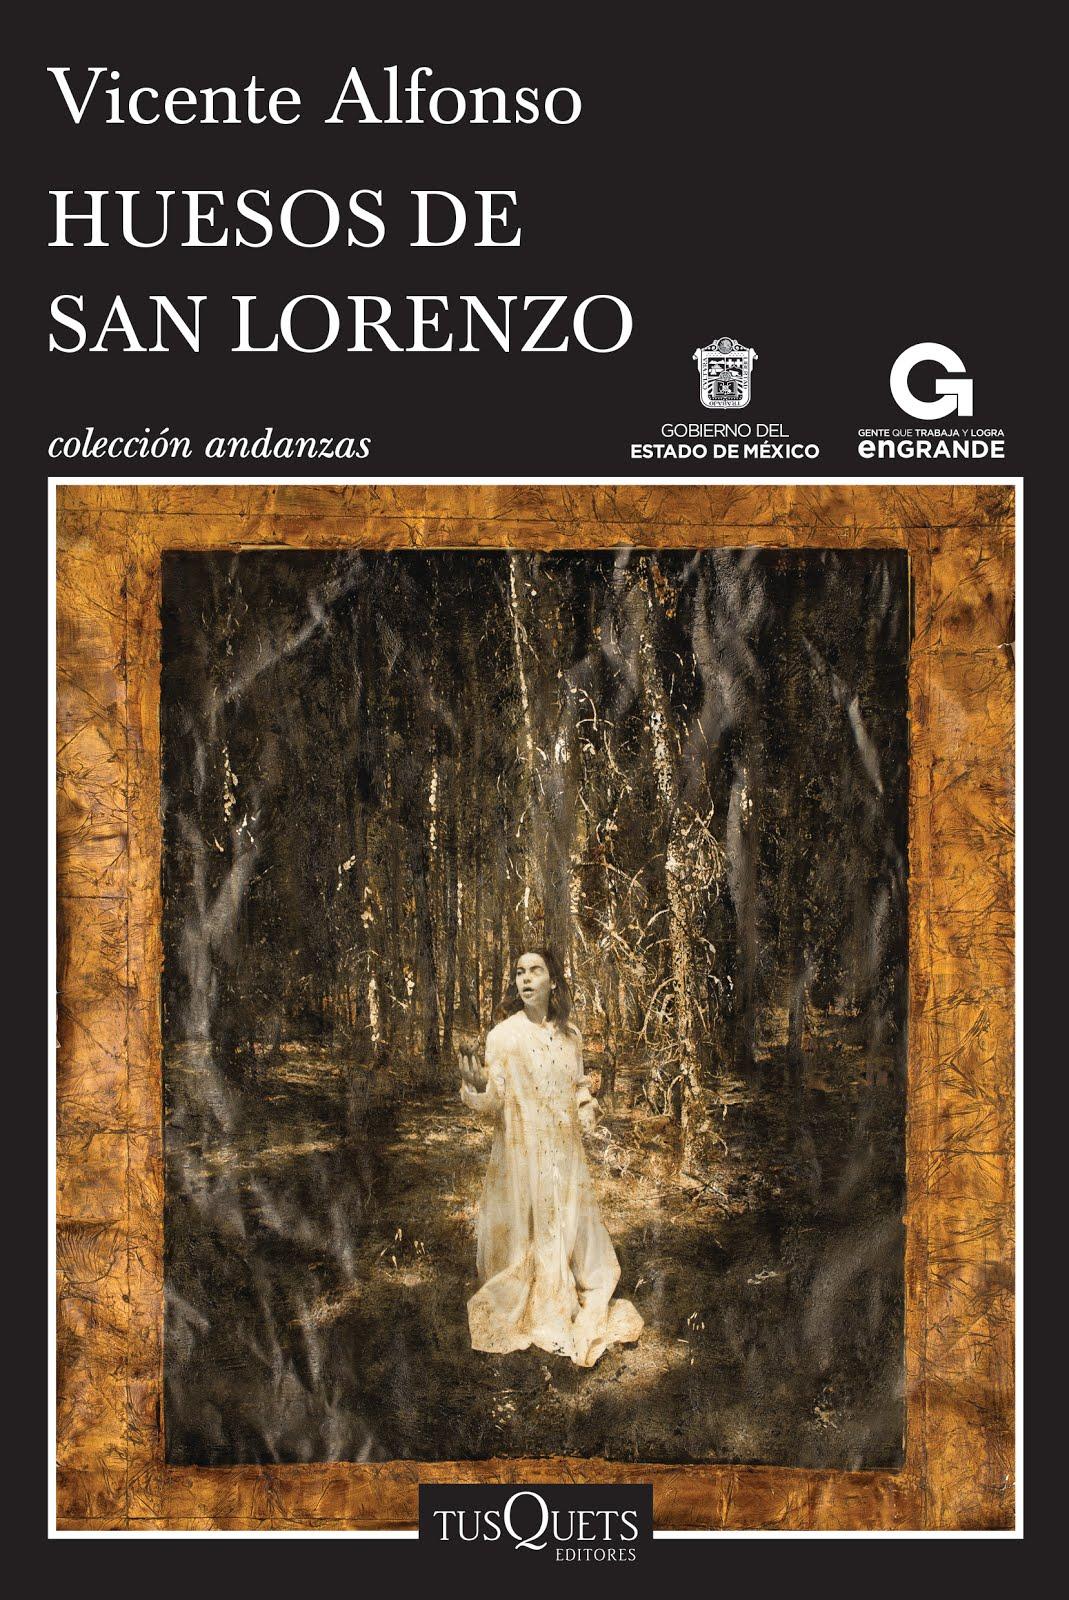 Huesos de San Lorenzo